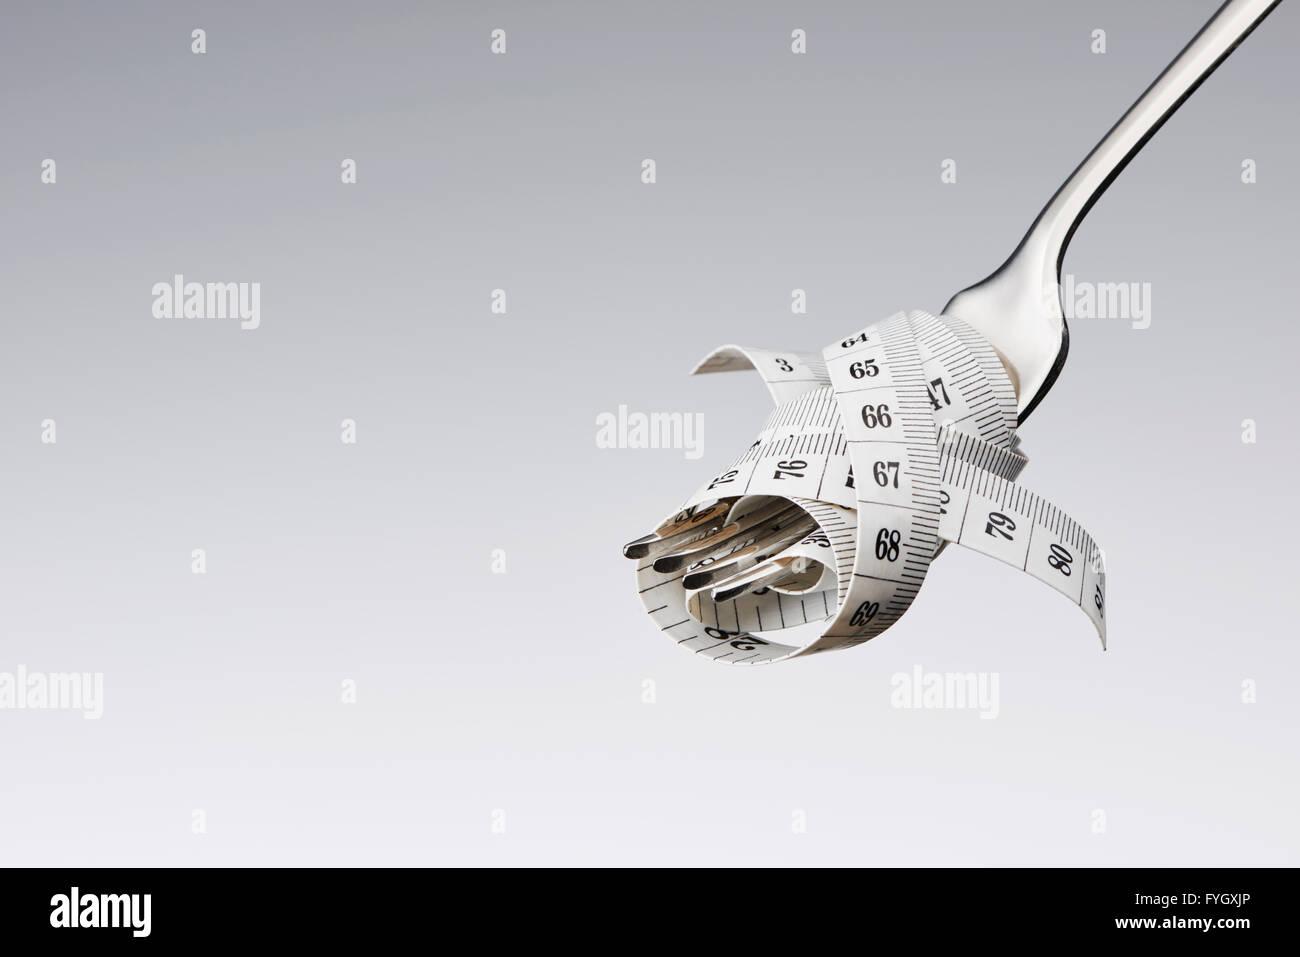 Horquilla con cinta métrica, adietando concepto Obesidad Imagen De Stock